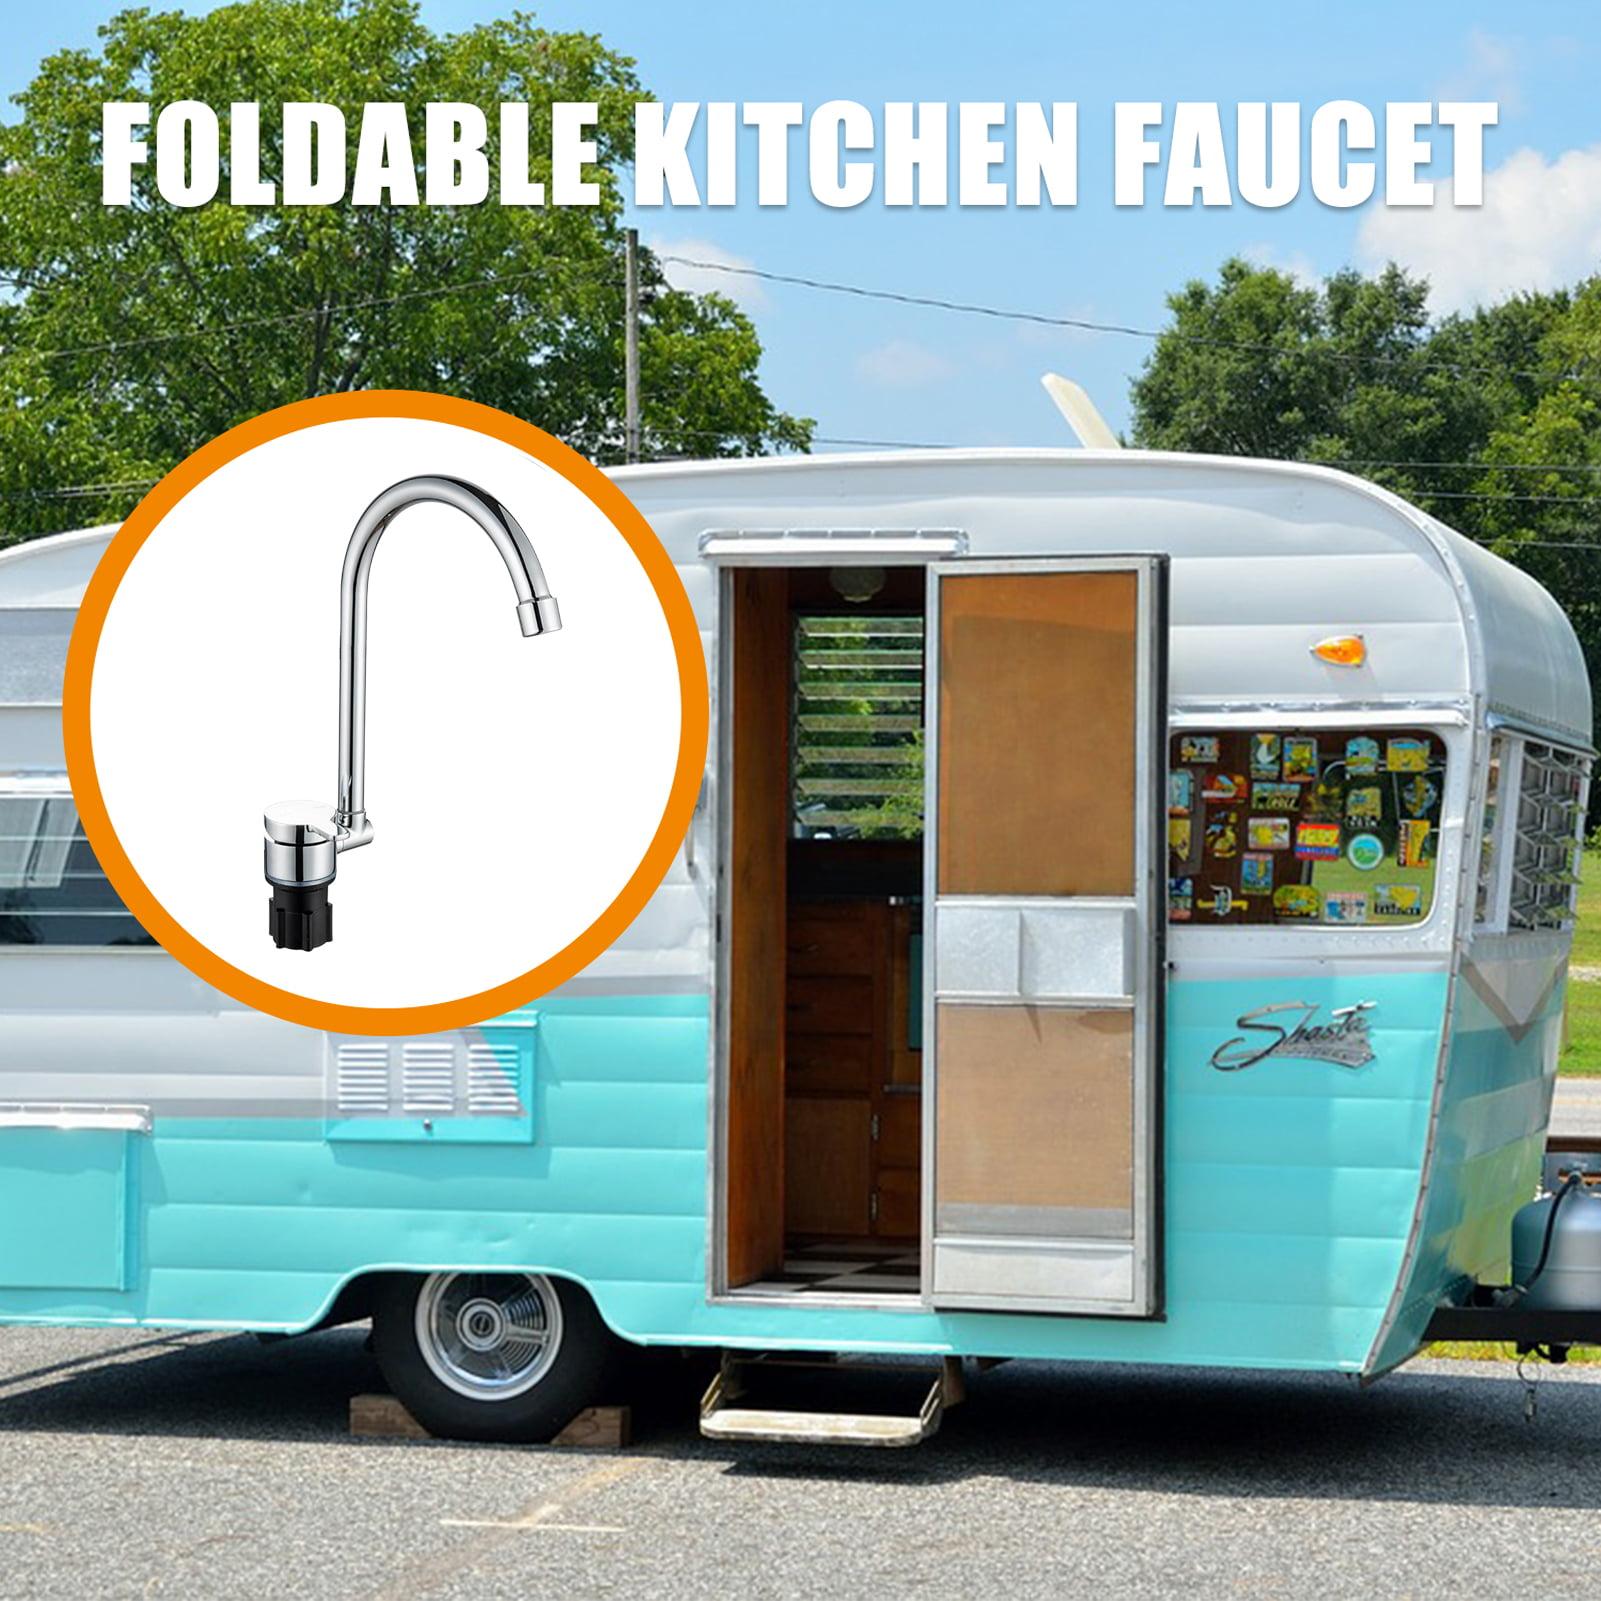 Foldable 360°Rotation RV Caravan Boat Mobile Home Kitchen Faucet Tap copper+hose